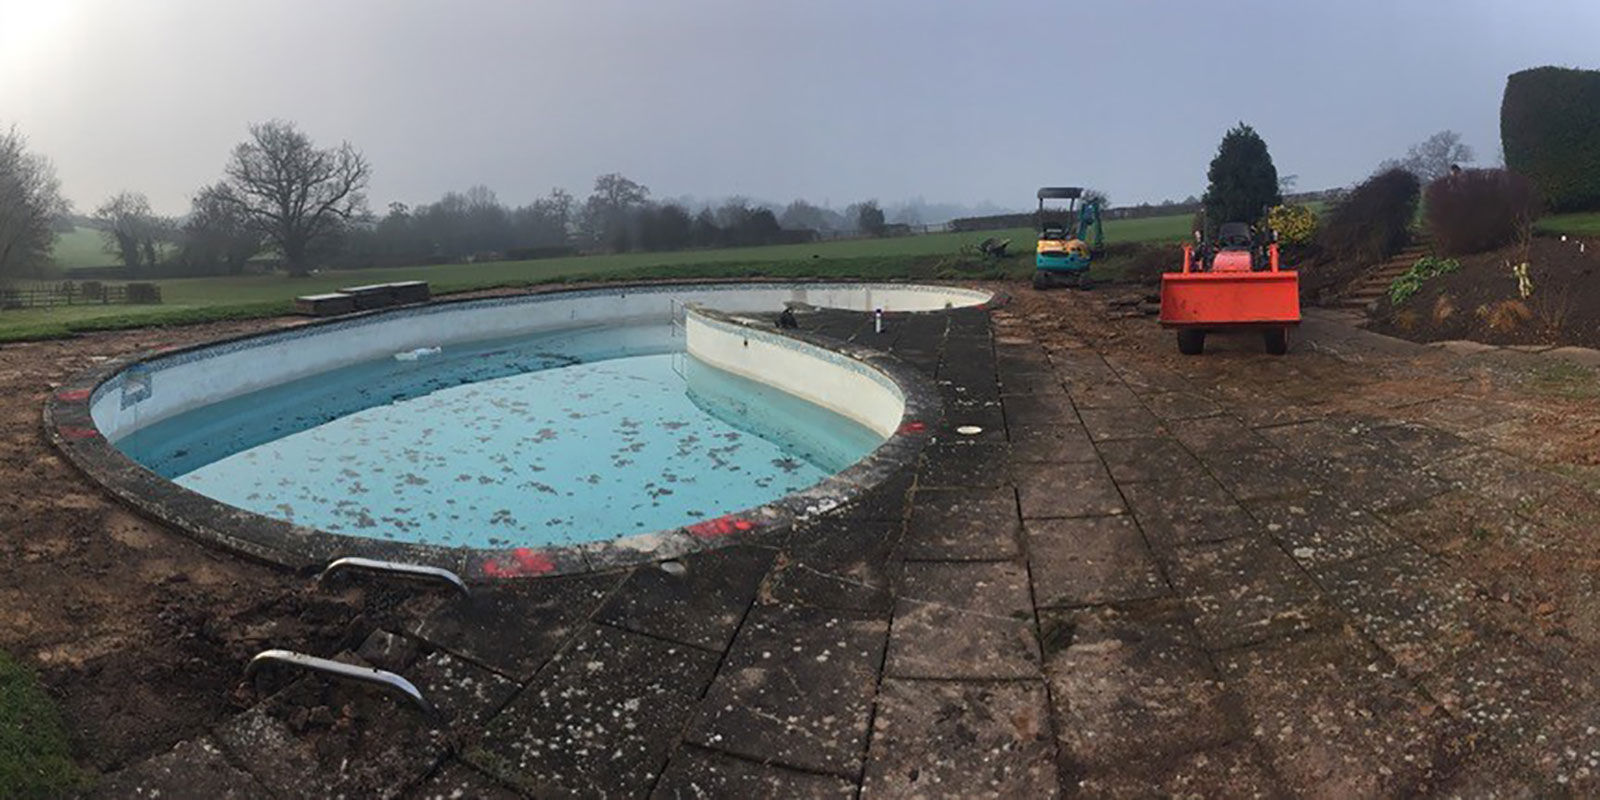 Old swimming pool